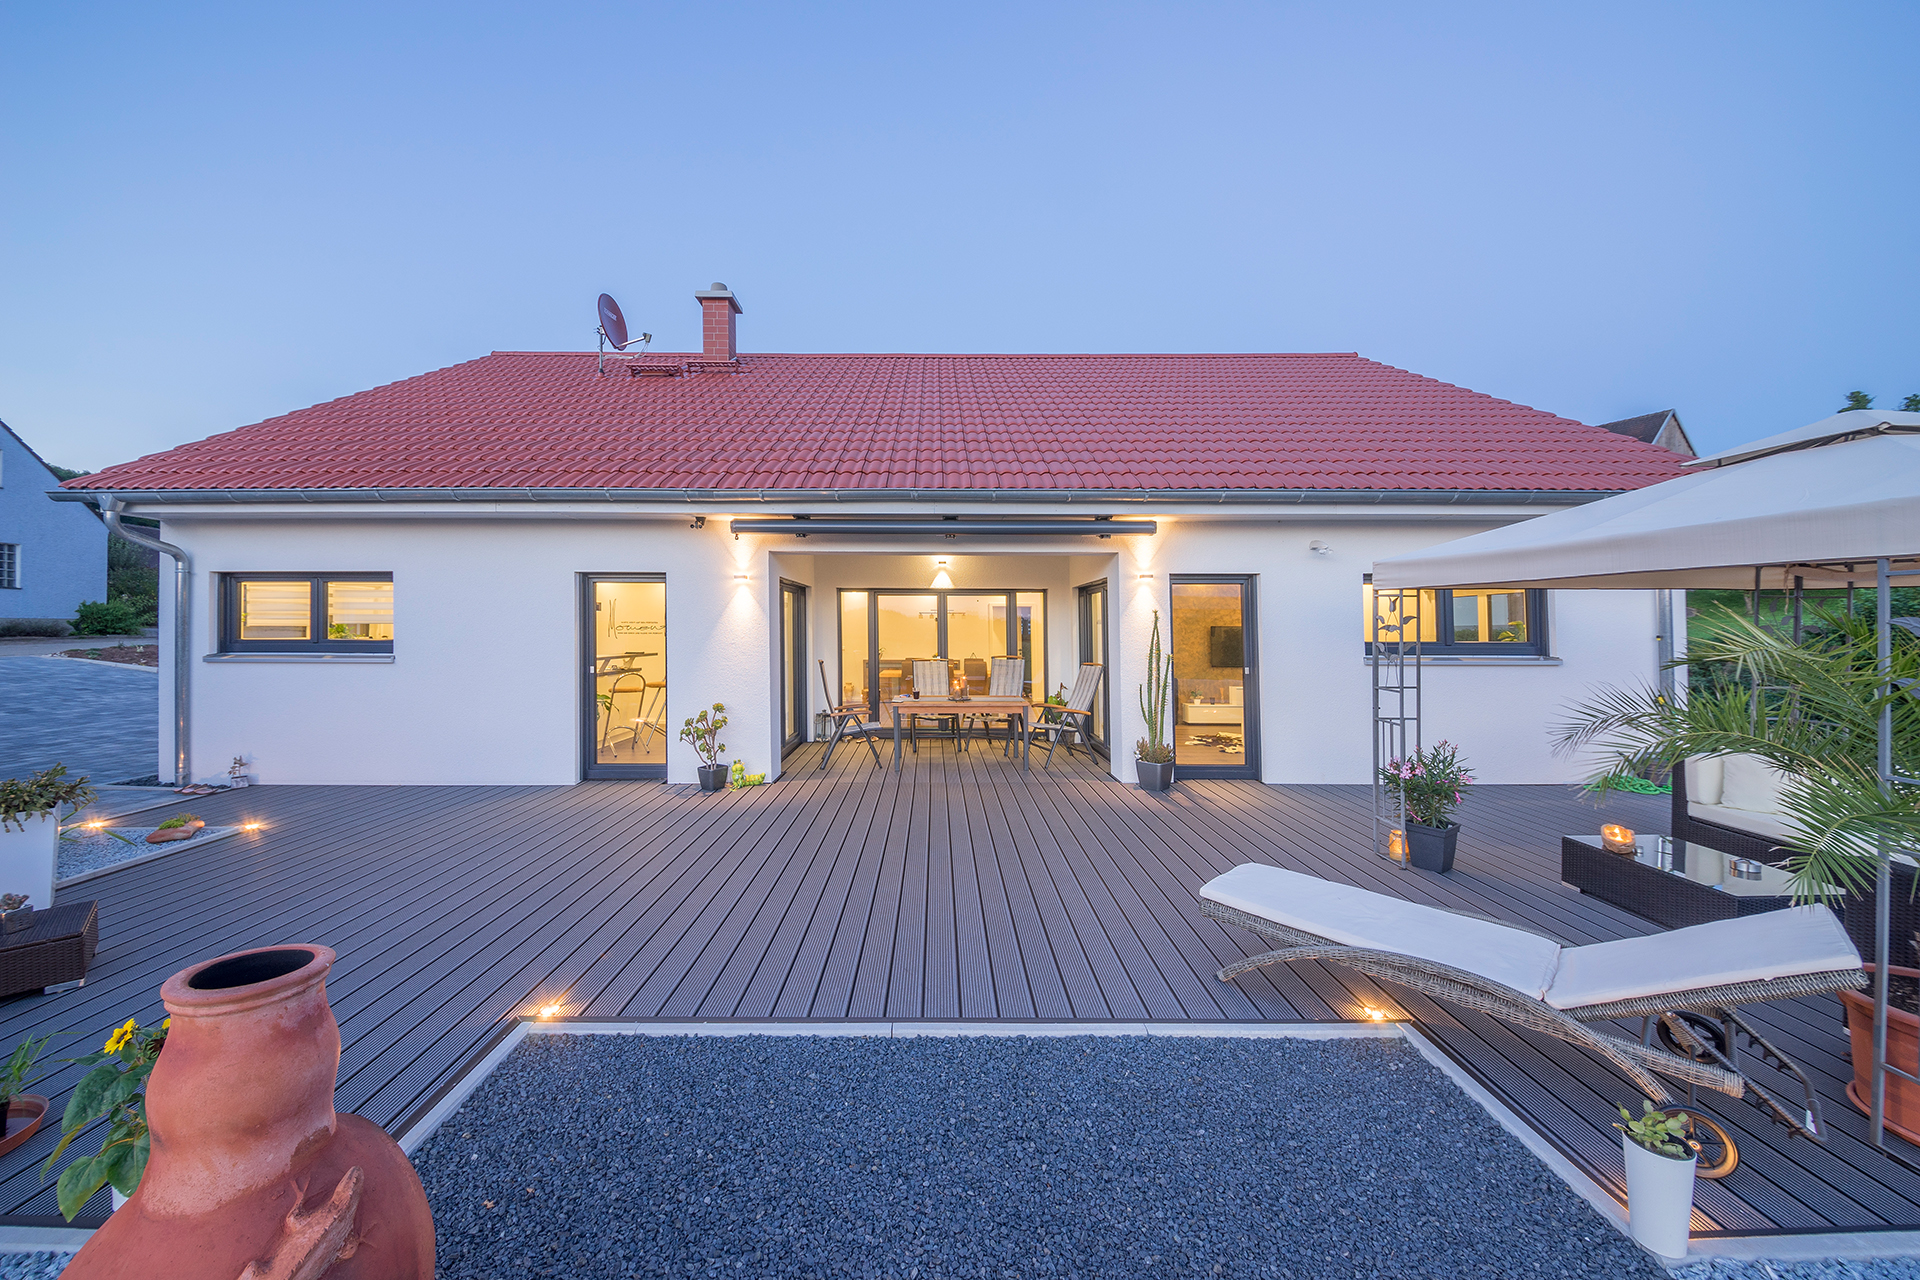 referenz einfamilienhaus bungalow 138 fischerhaus. Black Bedroom Furniture Sets. Home Design Ideas